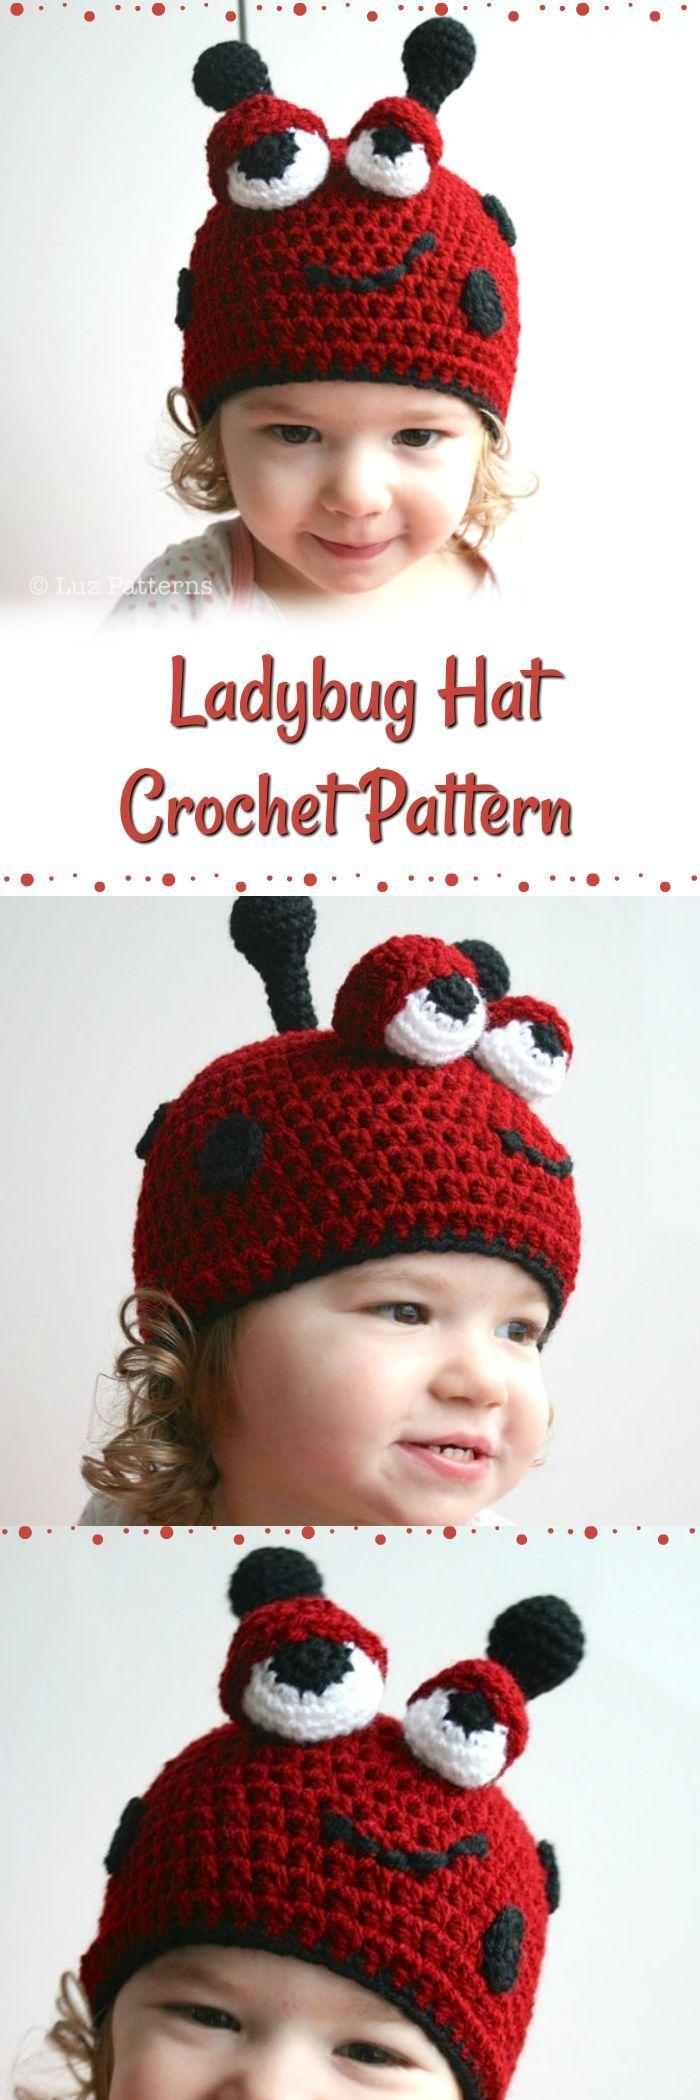 Ladybug Hat Crochet Pattern. Instant pdf pattern download. What a ...